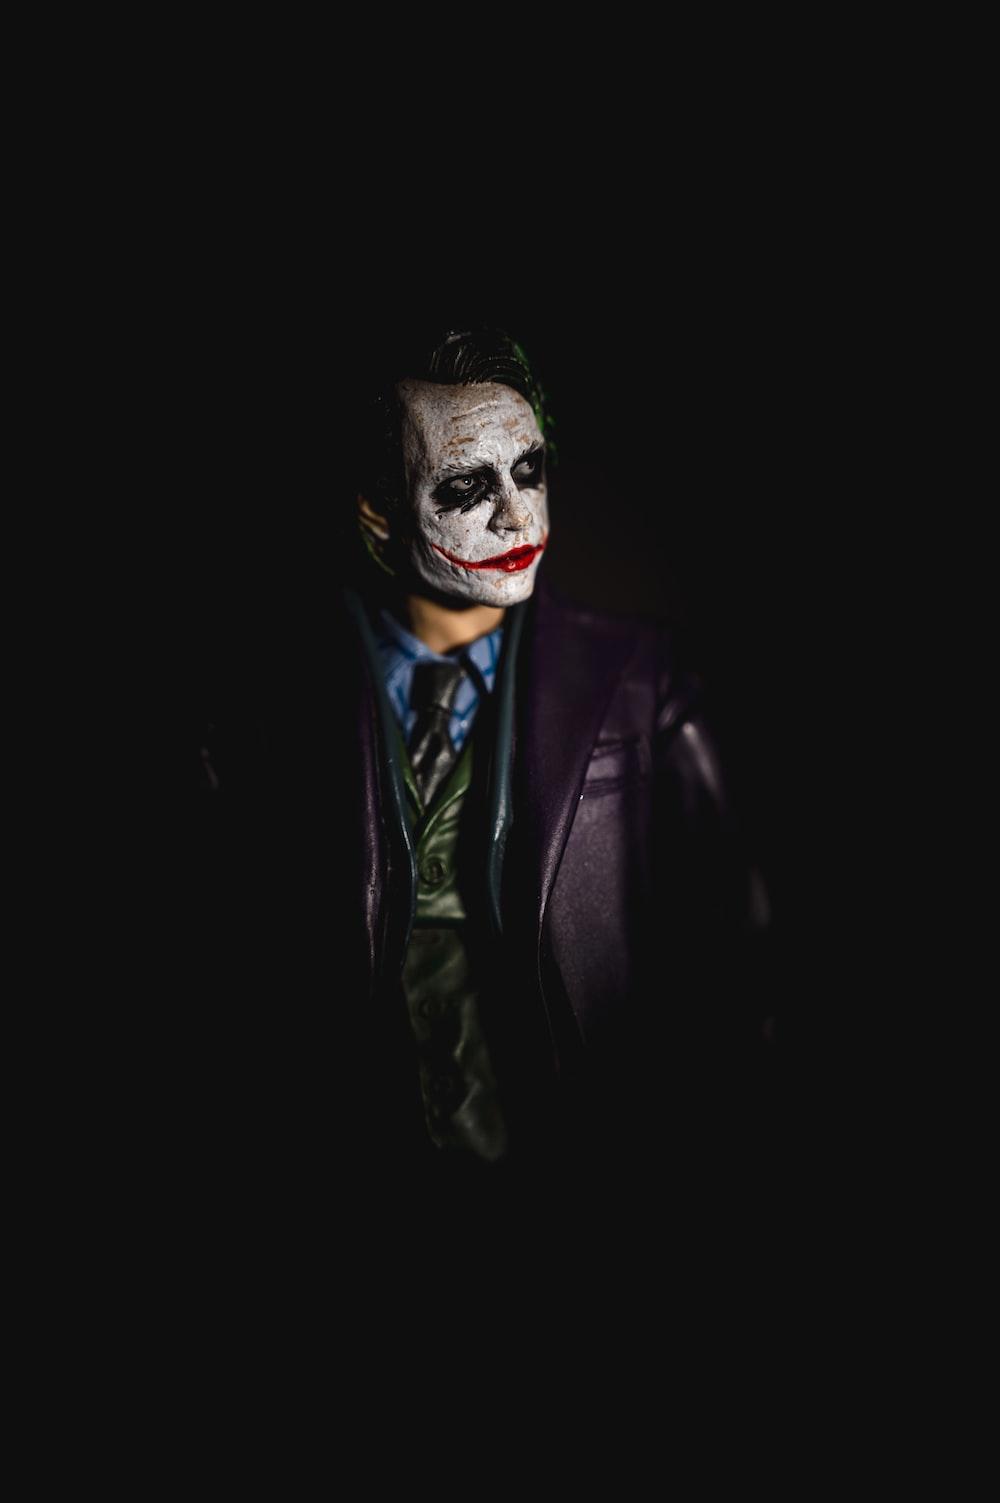 750 Joker Mask Wallpapers Download Hd Download Free Images On Unsplash